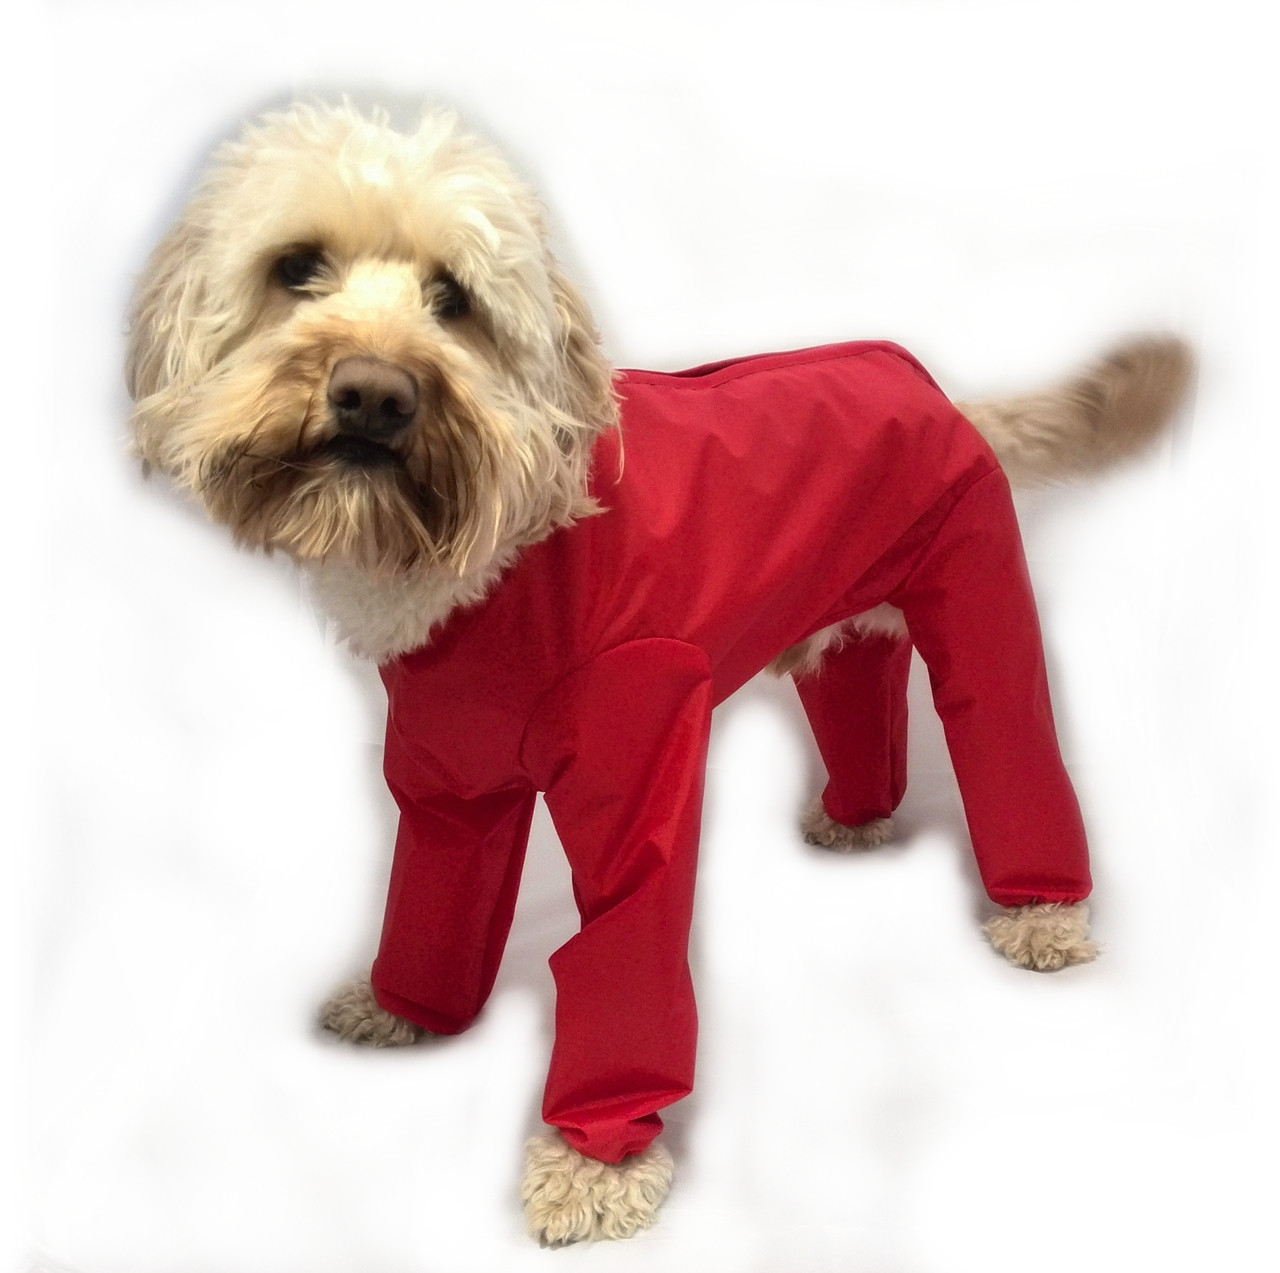 Trouser Suit Waterproof Dog Coat With Legs